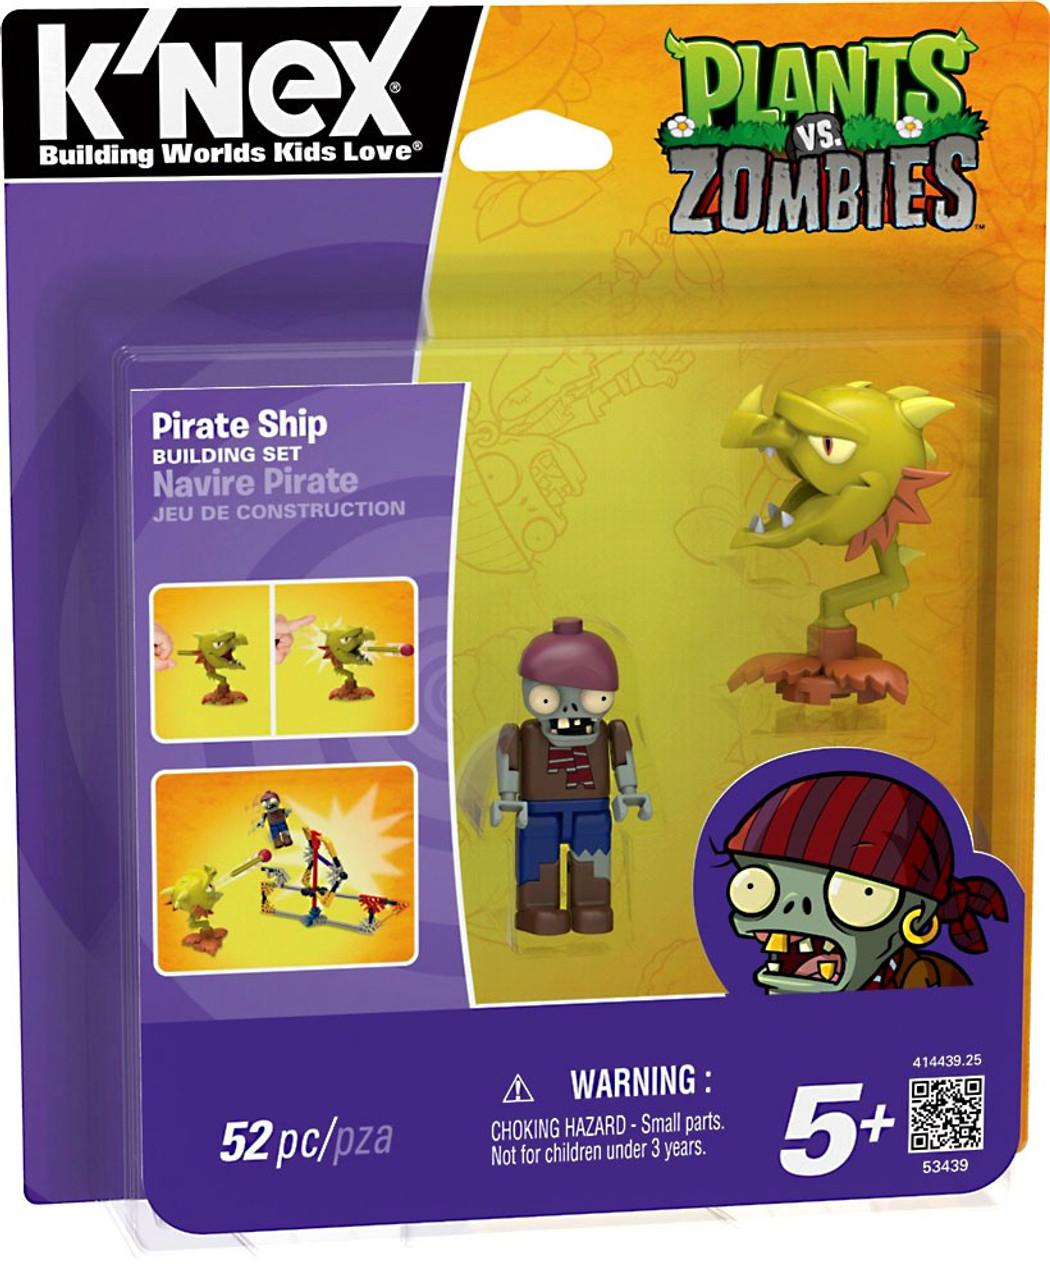 K'NEX Plants vs. Zombies Pirate Ship Set #53439